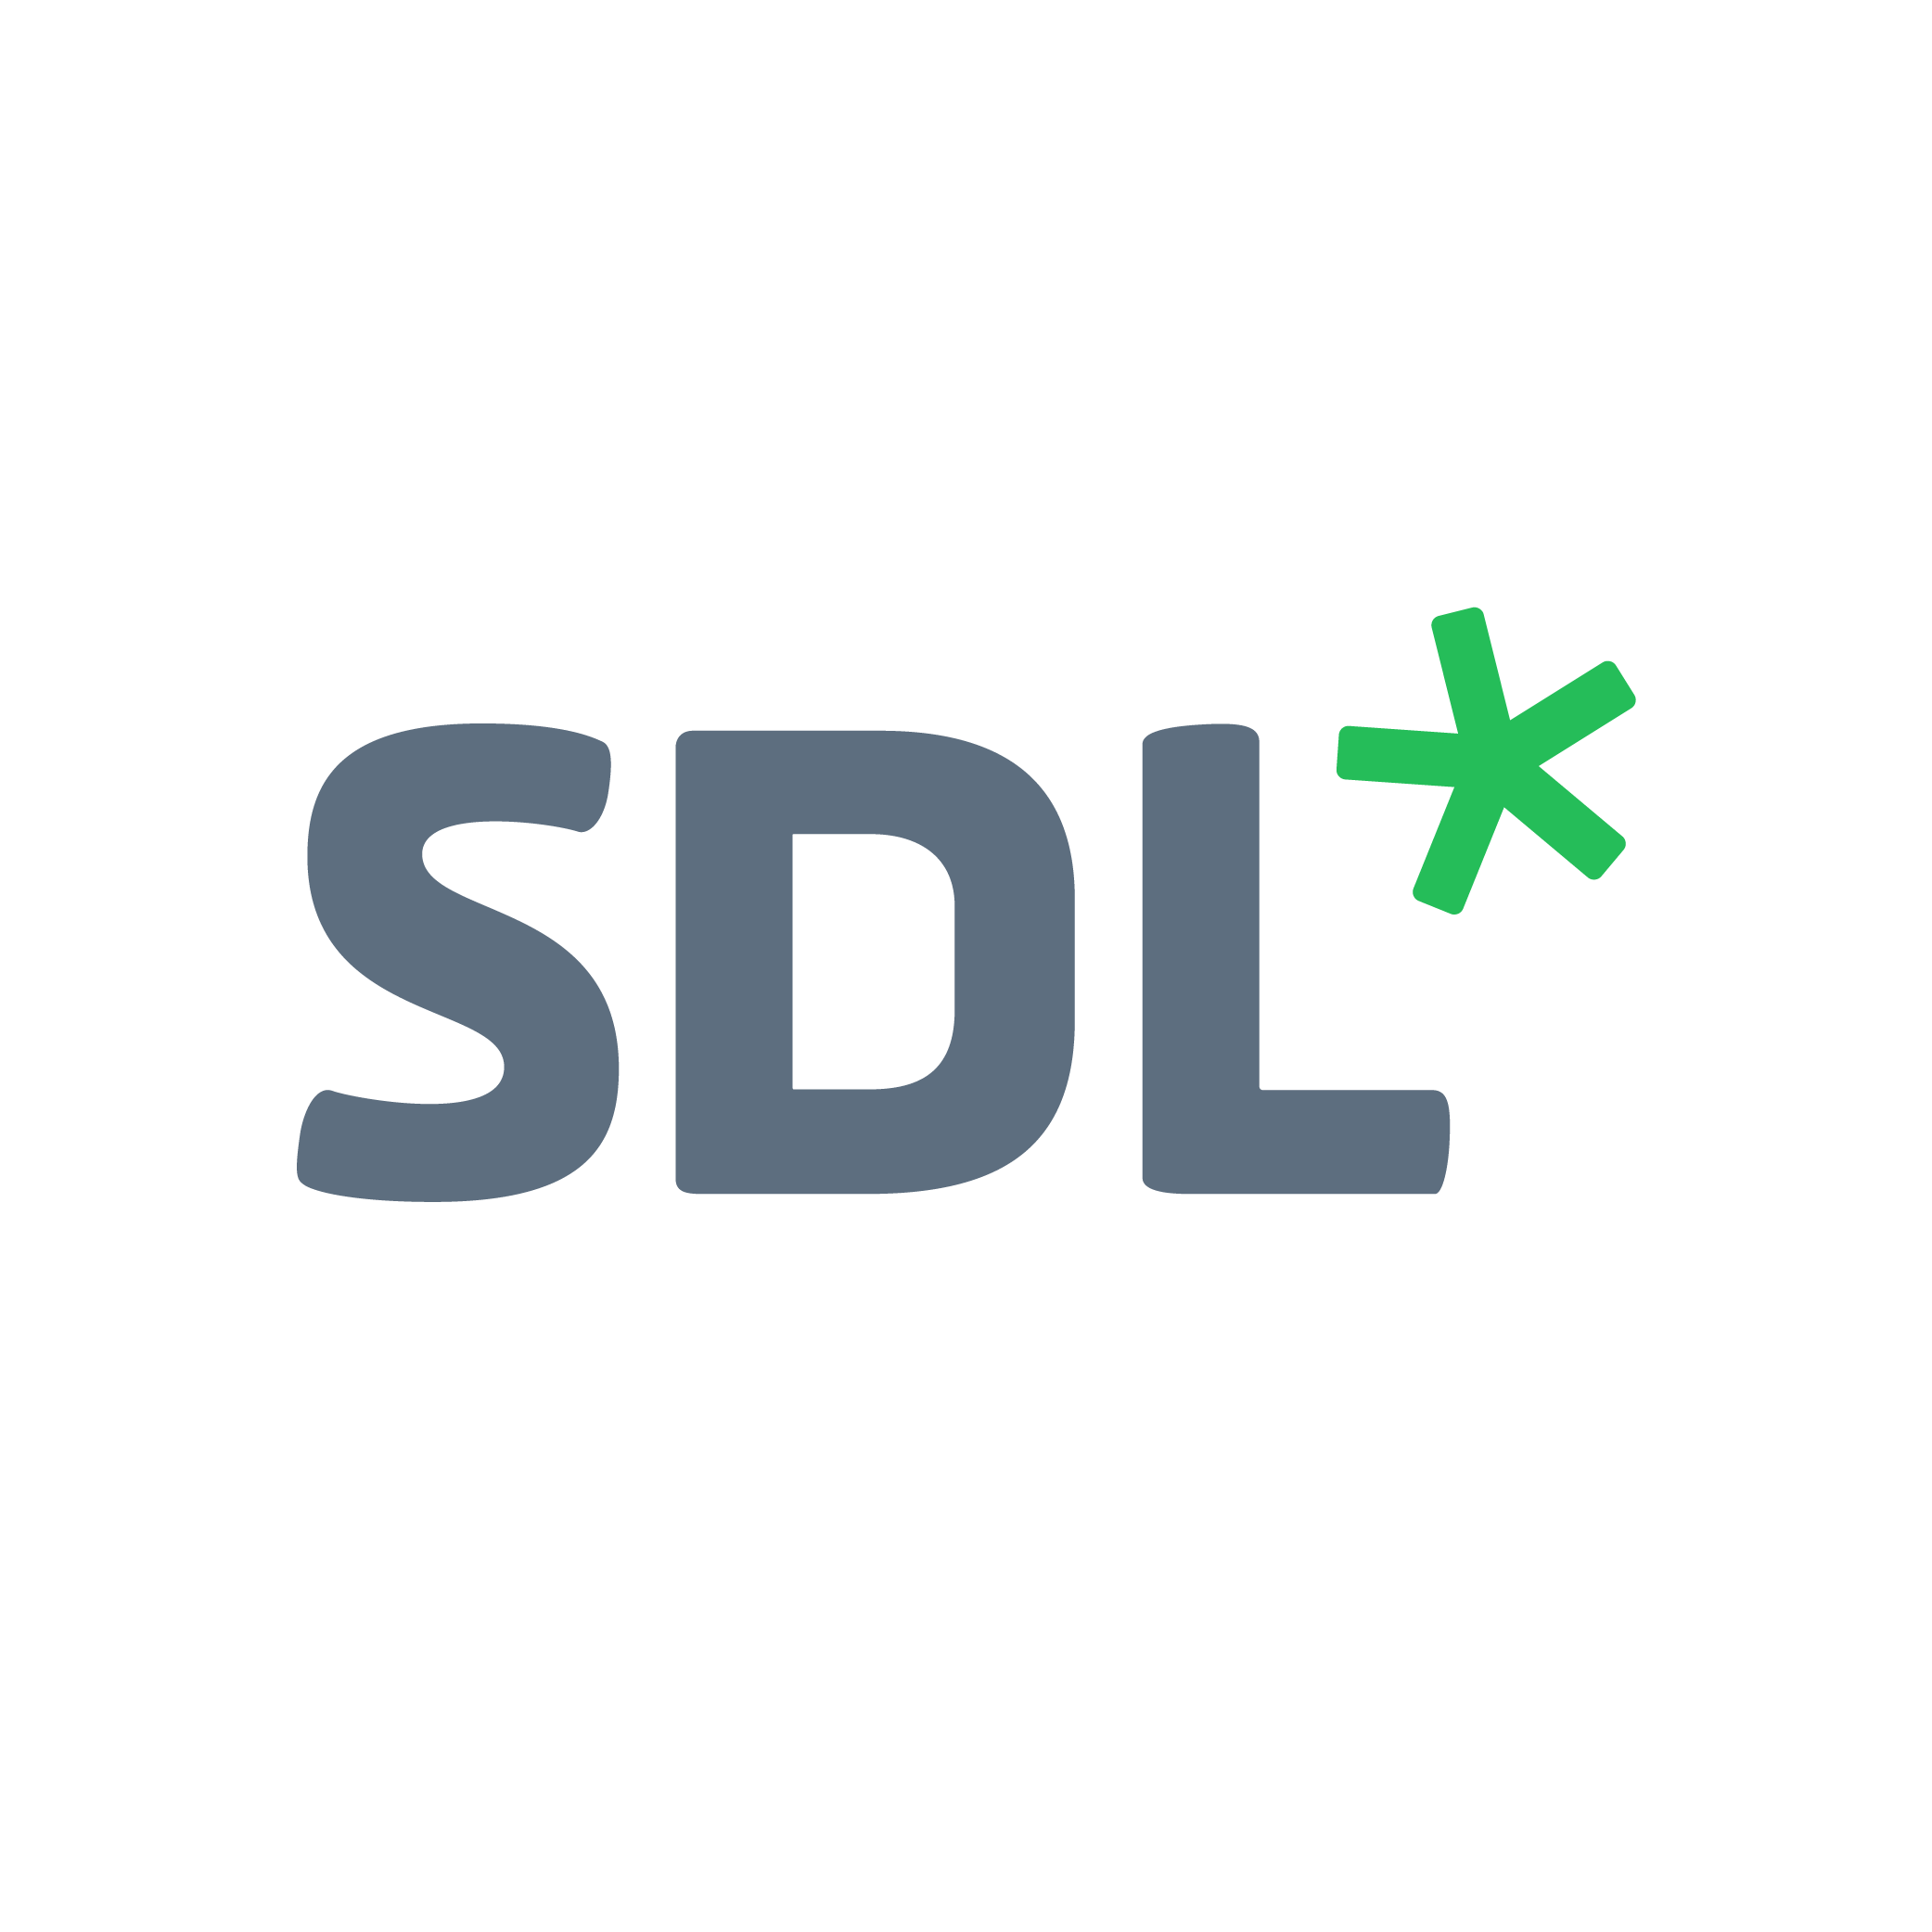 sdl-finland-kaantaja-turku-sdsuu-3384233 logo